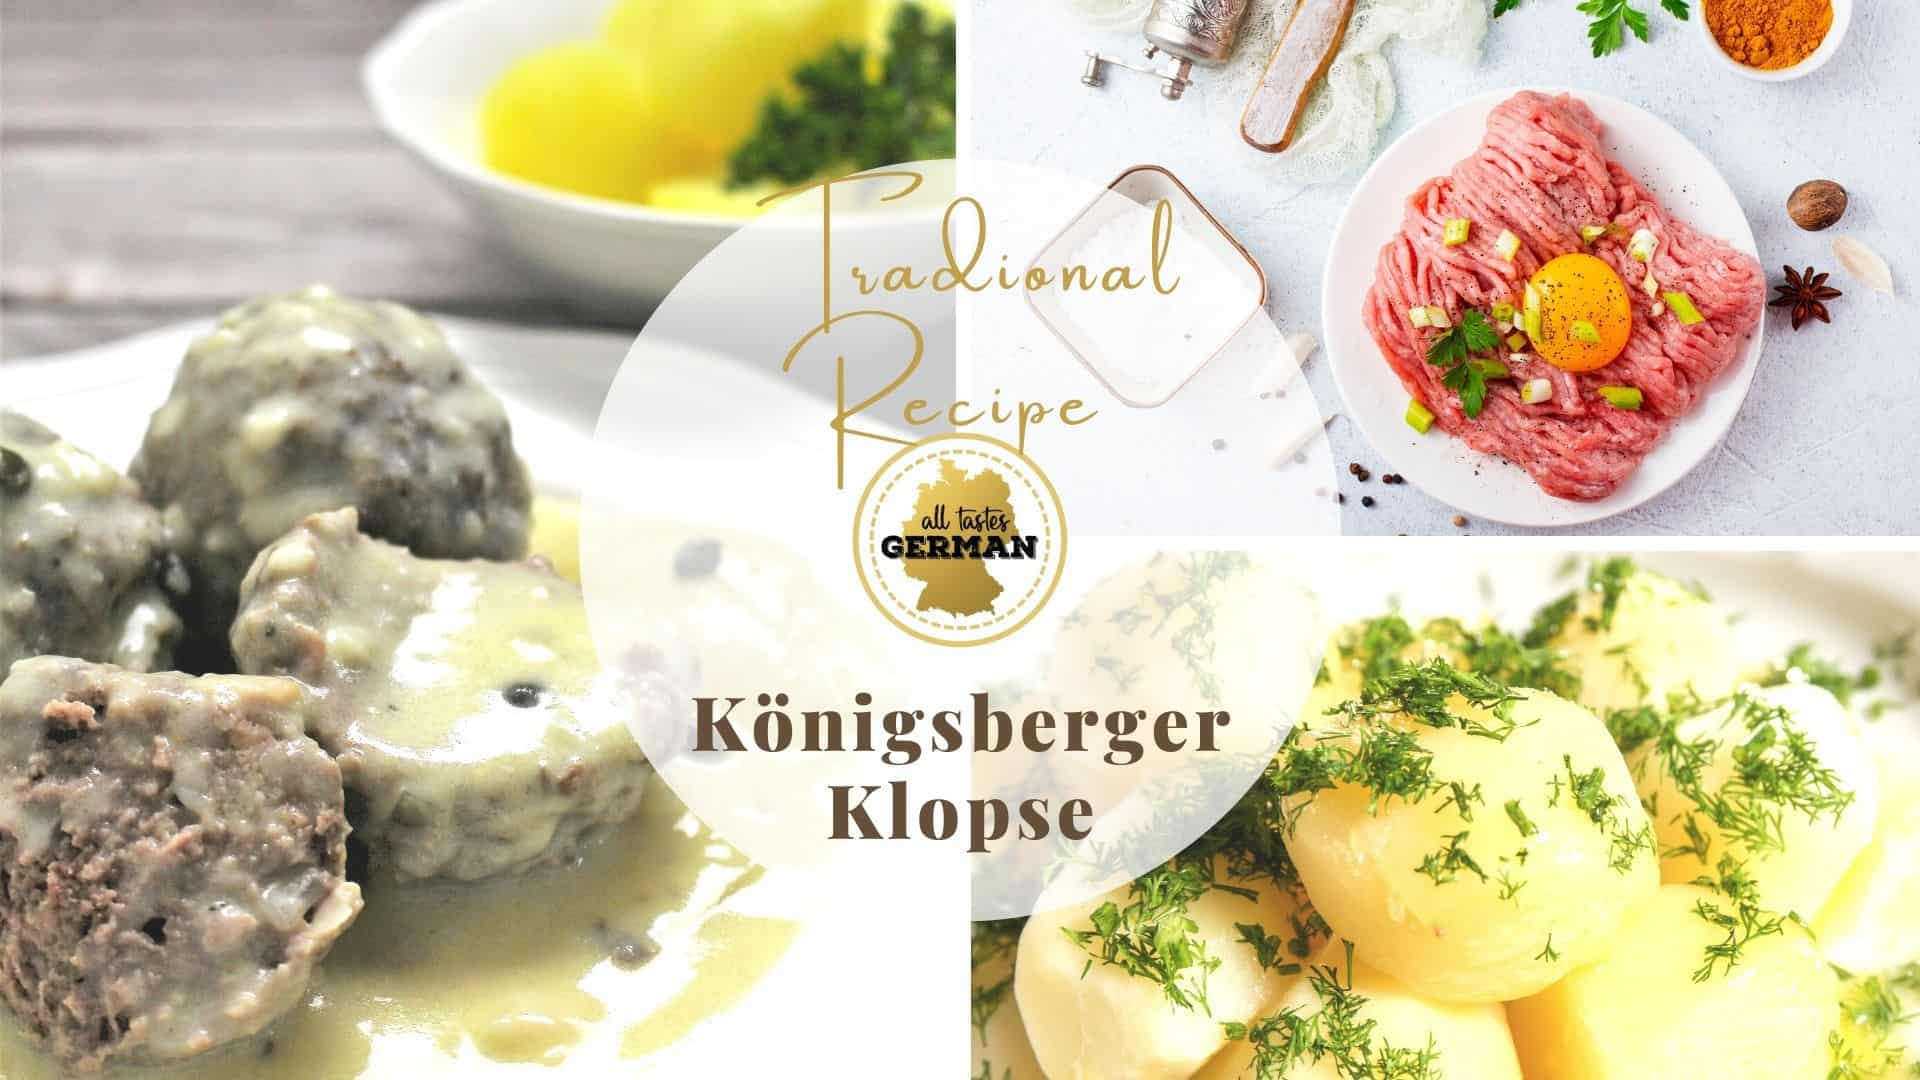 Königsberger Klopse ingredients and side dish